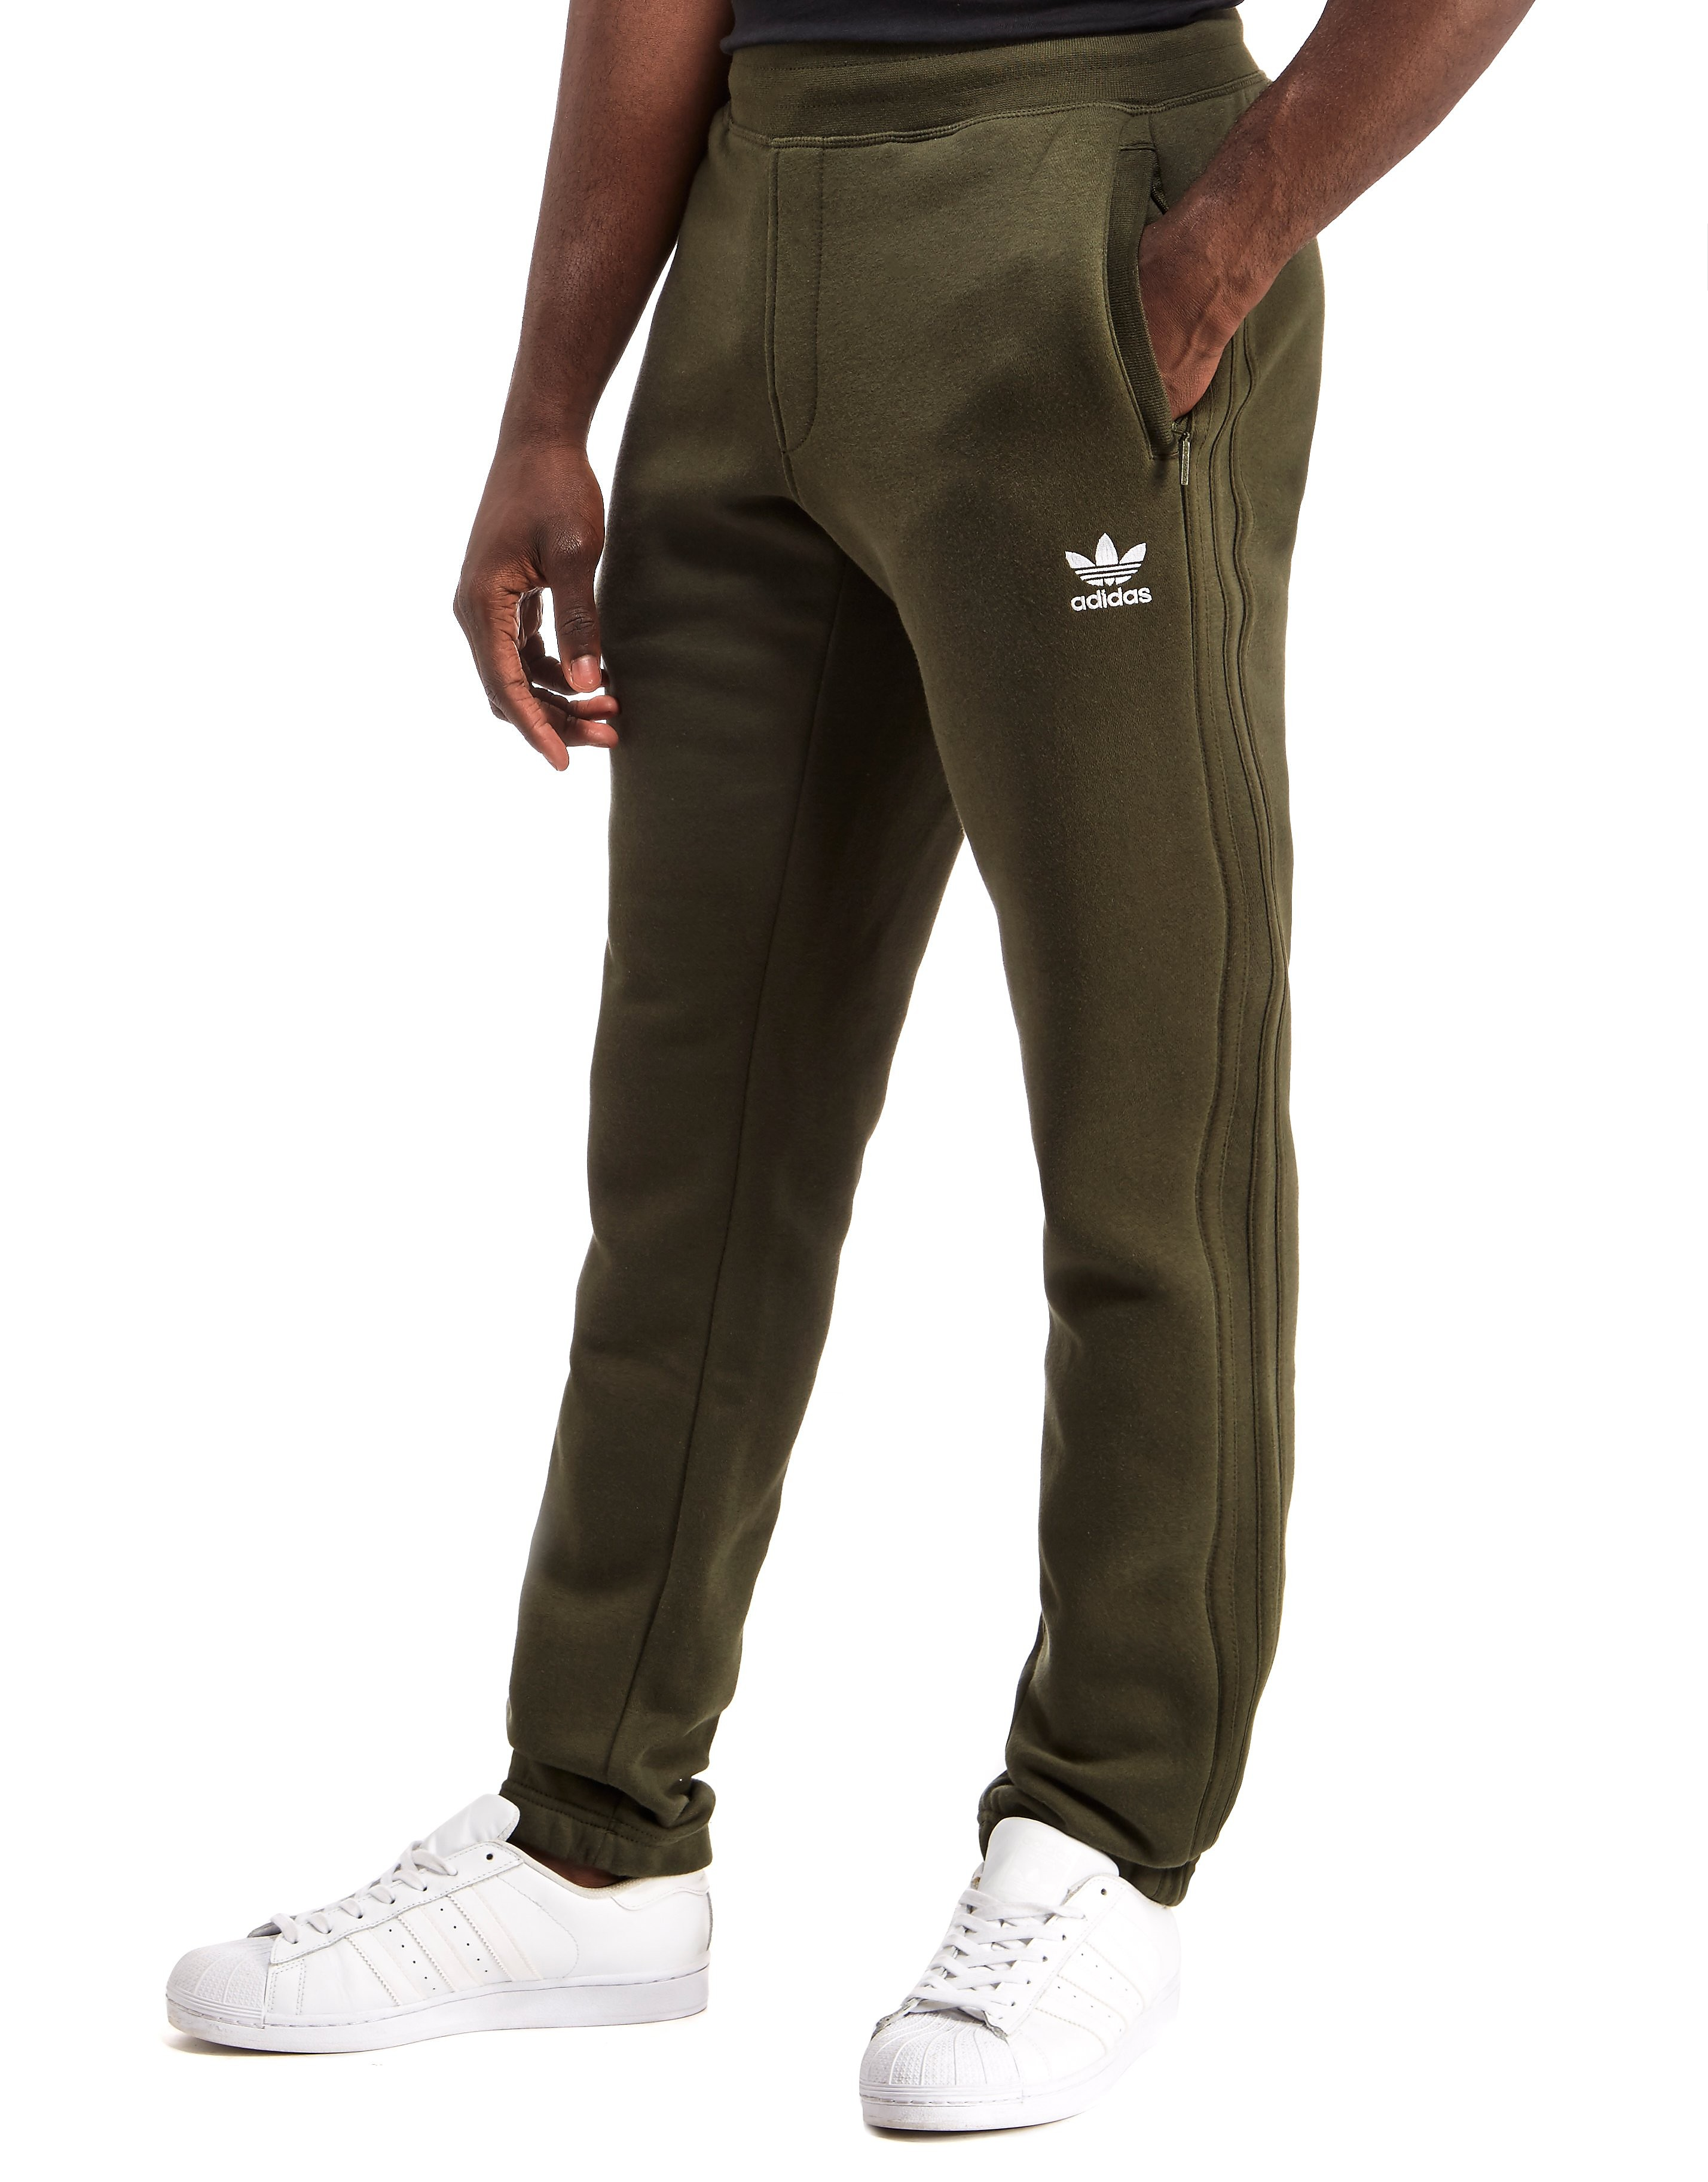 adidas Originals Premium 3-Stripe Fleece Pants